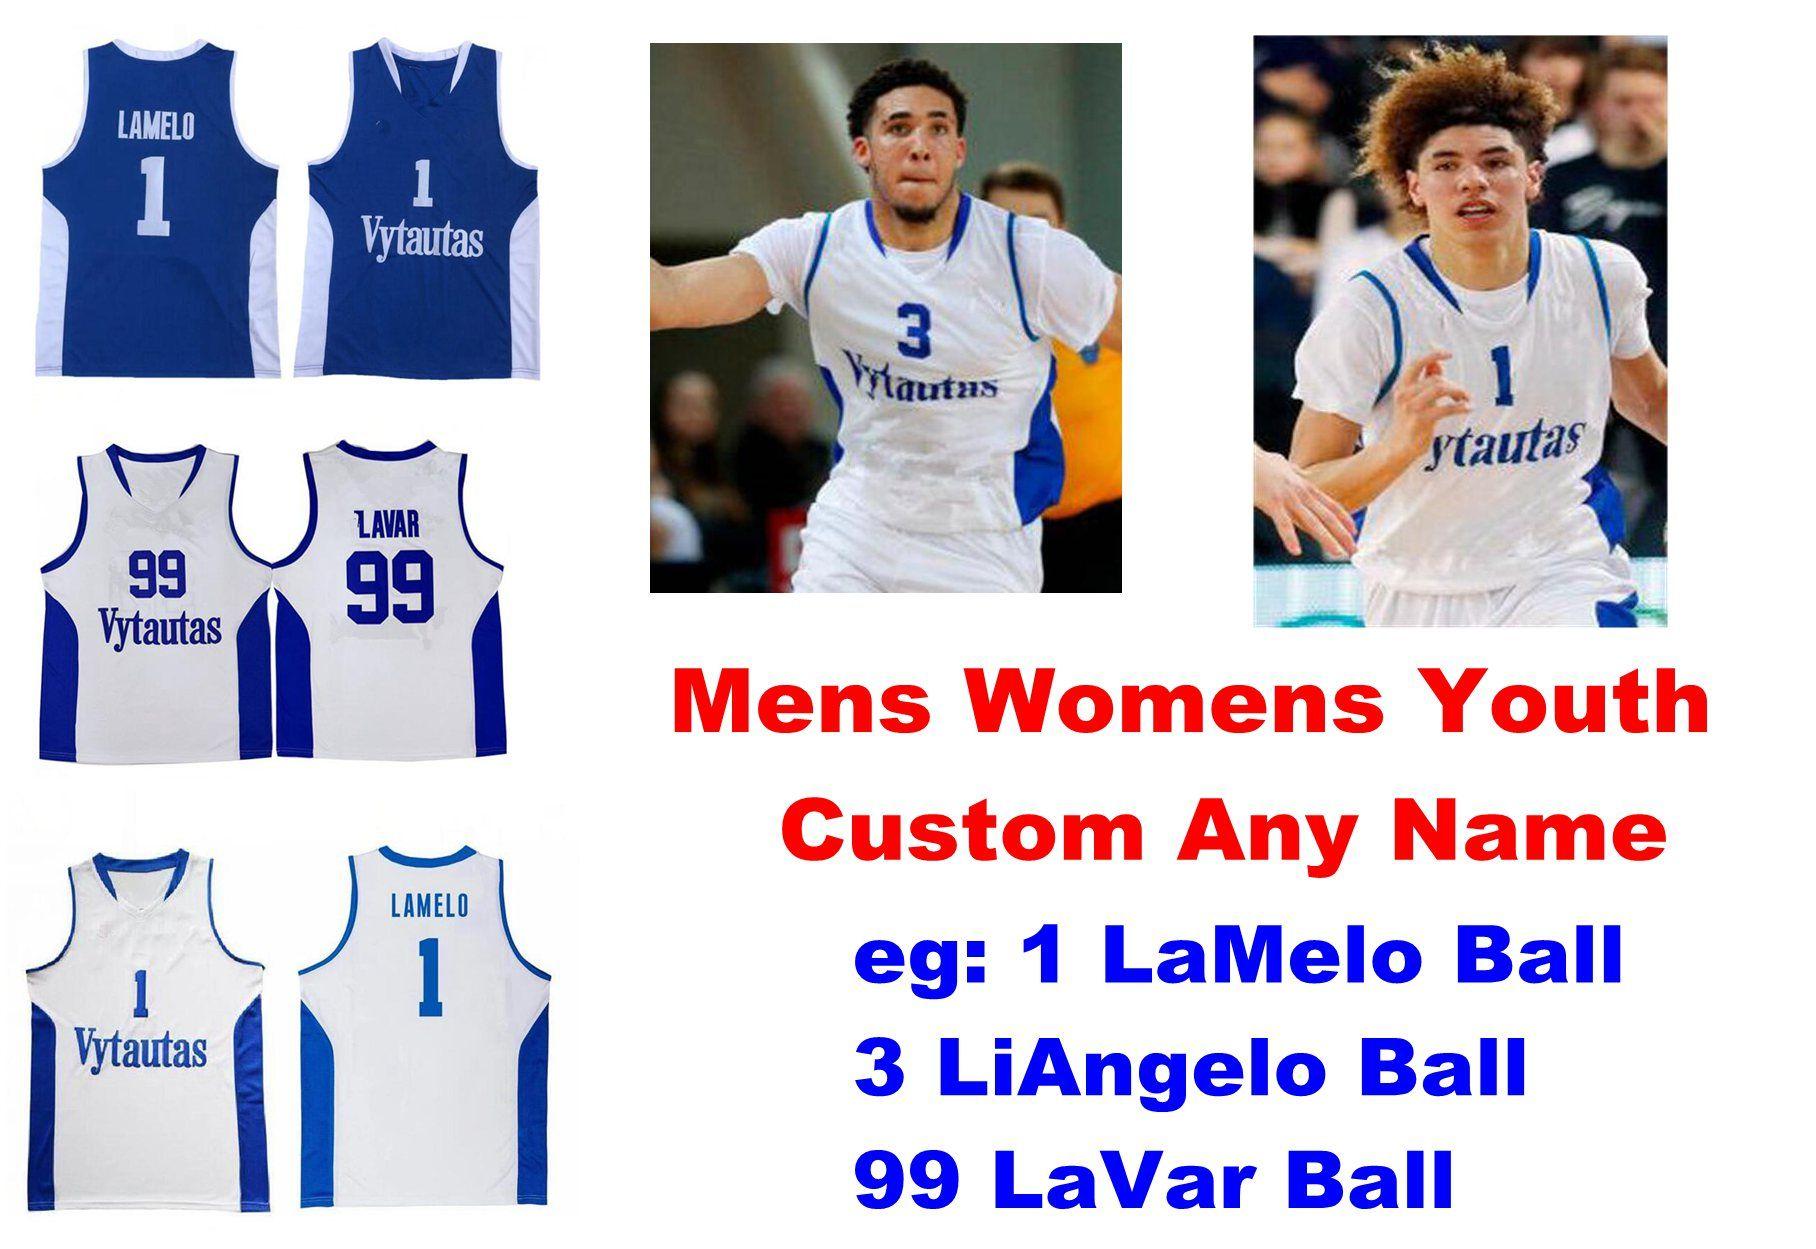 Lituania Prienu Vytautas JerseAys Mens 1 Lamelo Ball Jersey 3 Liangelo Ball 99 Lavar Ball Ballball Jerseys Personalizar cosido